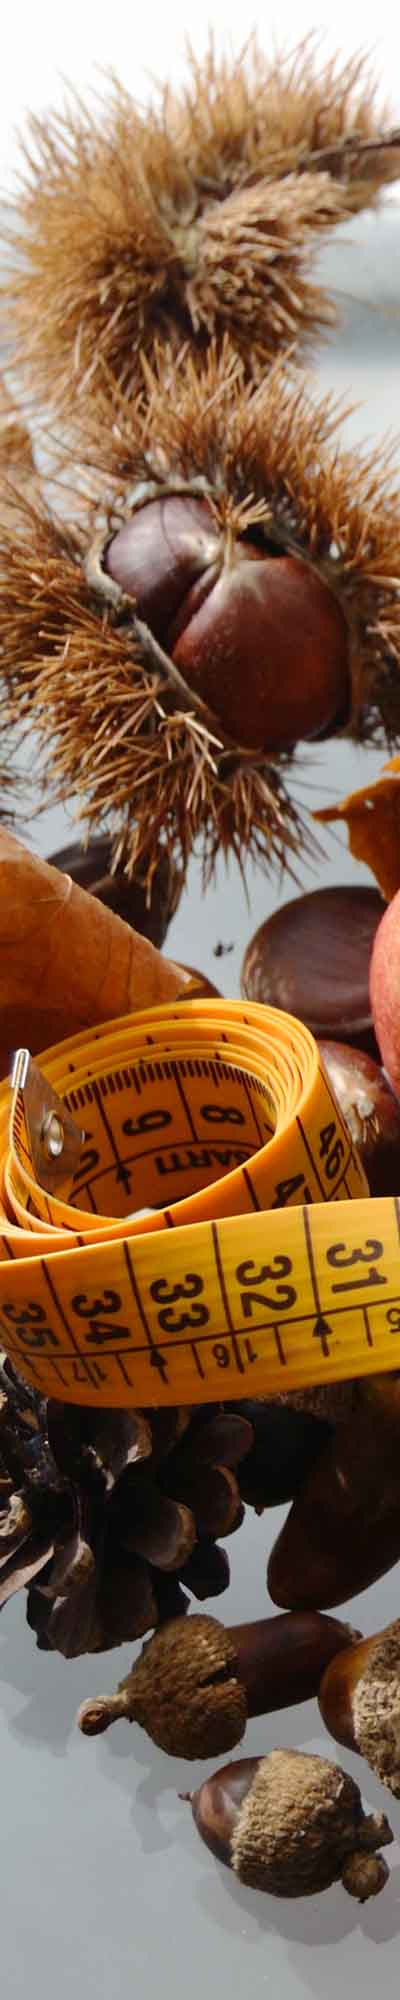 otoño: magazine de alimentaicion sana, dietas para adelgazar, salud, zona de alimentacion